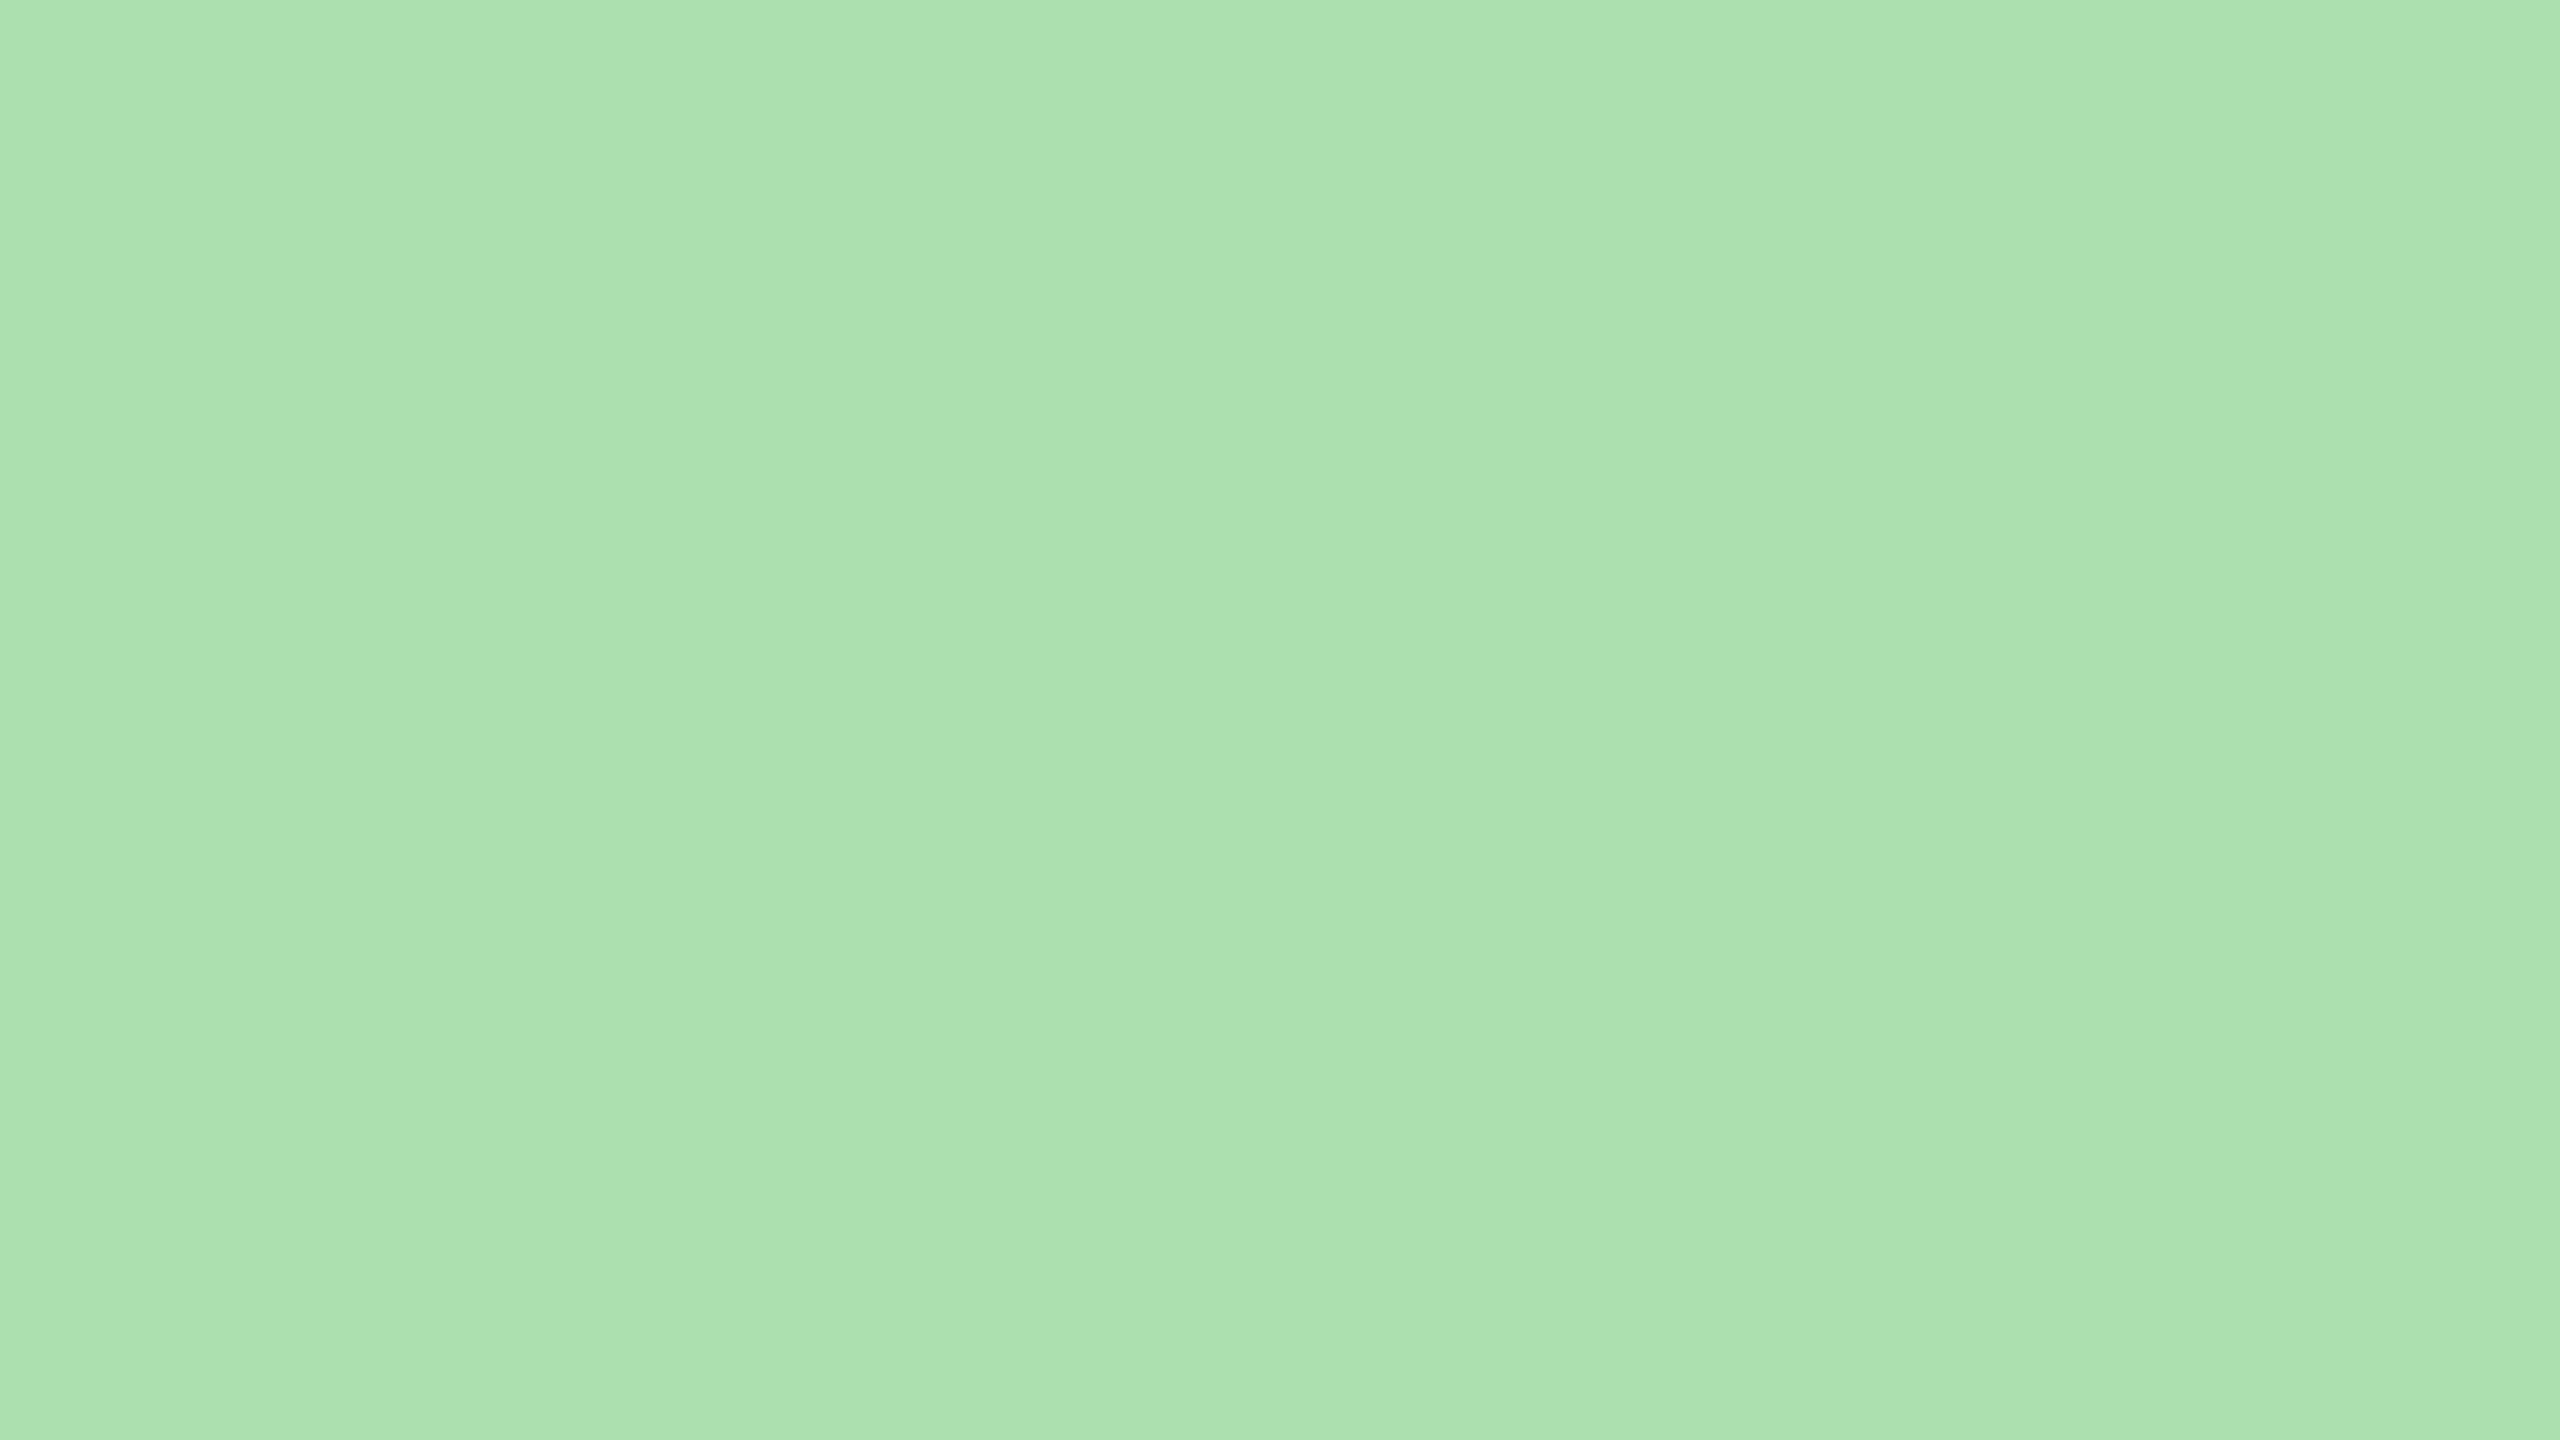 2560x1440 Celadon Solid Color Background